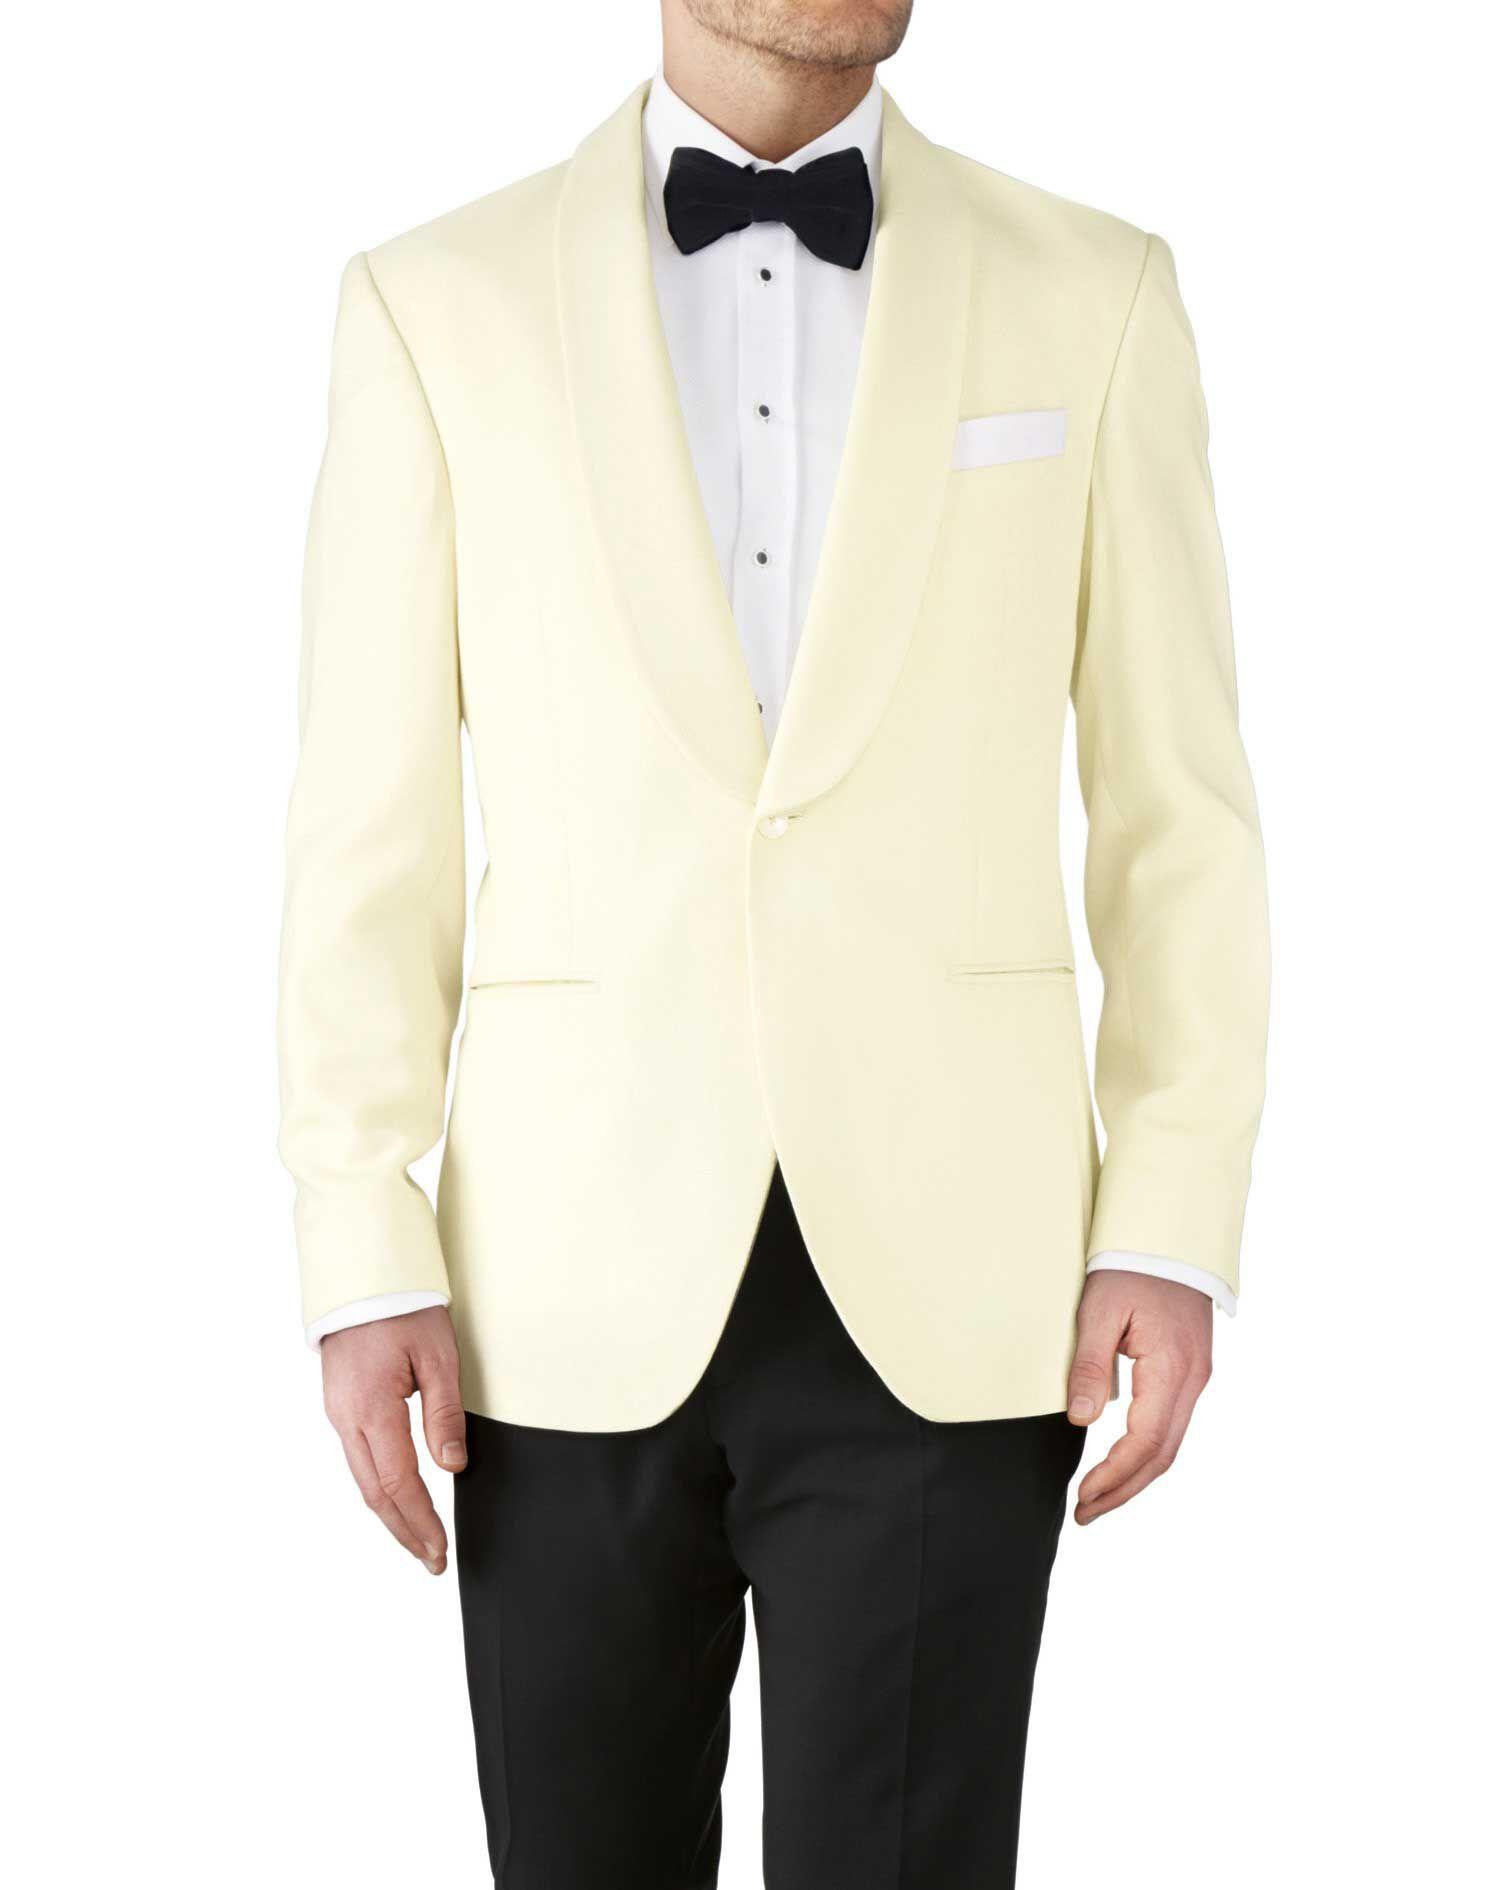 Cream Slim Fit Shawl Collar Tuxedo Super 110 Wool Jacket Size 40 Regular by Charles Tyrwhitt